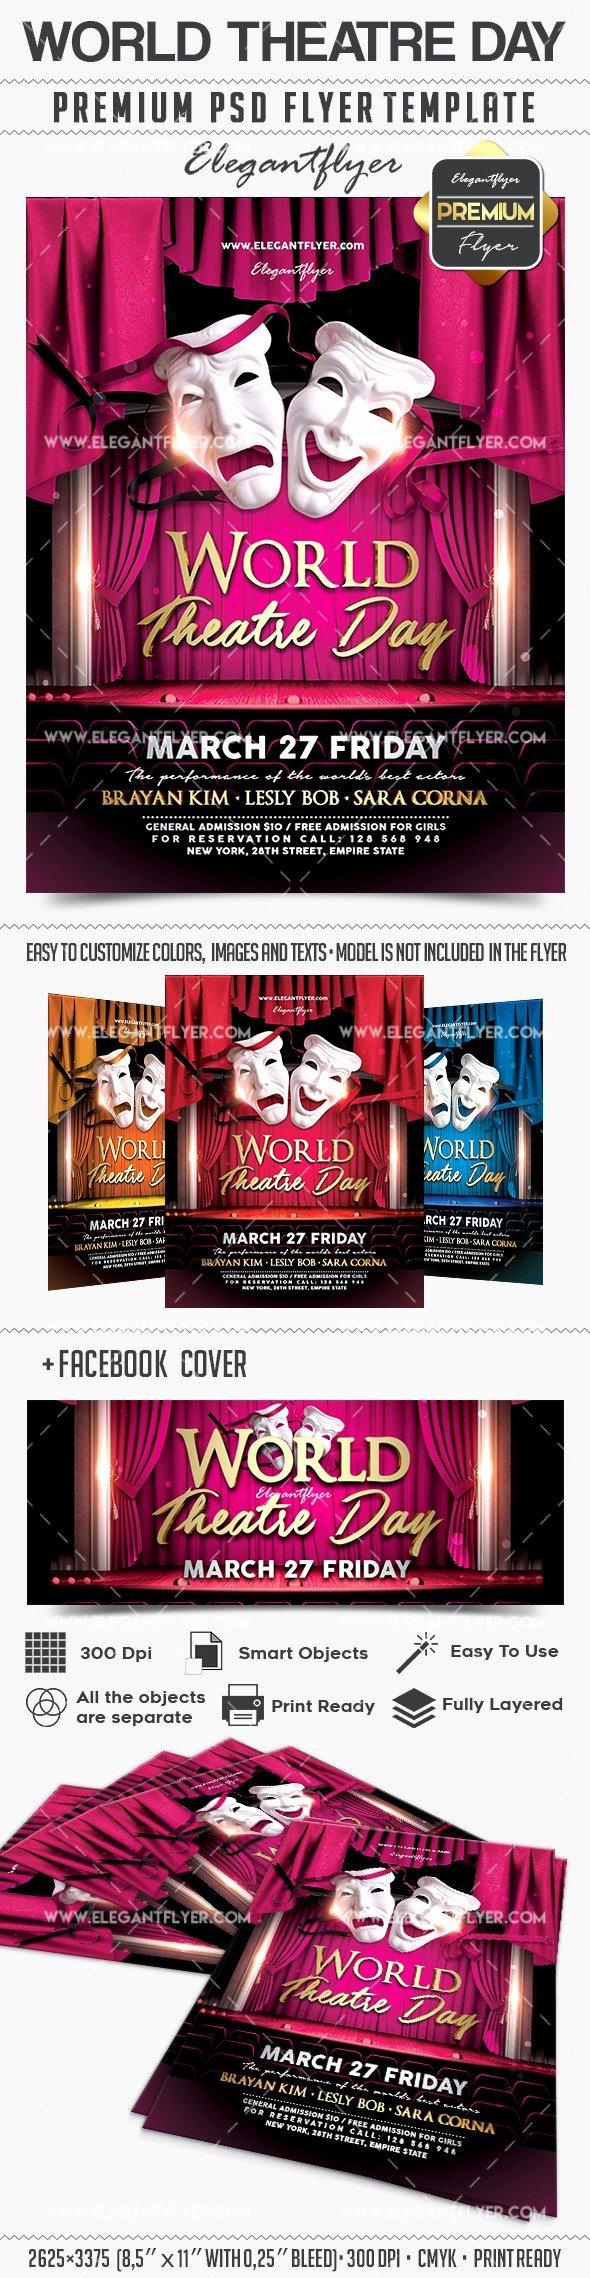 Theatre Program Template Best Of World theatre Day – Flyer Psd Template – by Elegantflyer